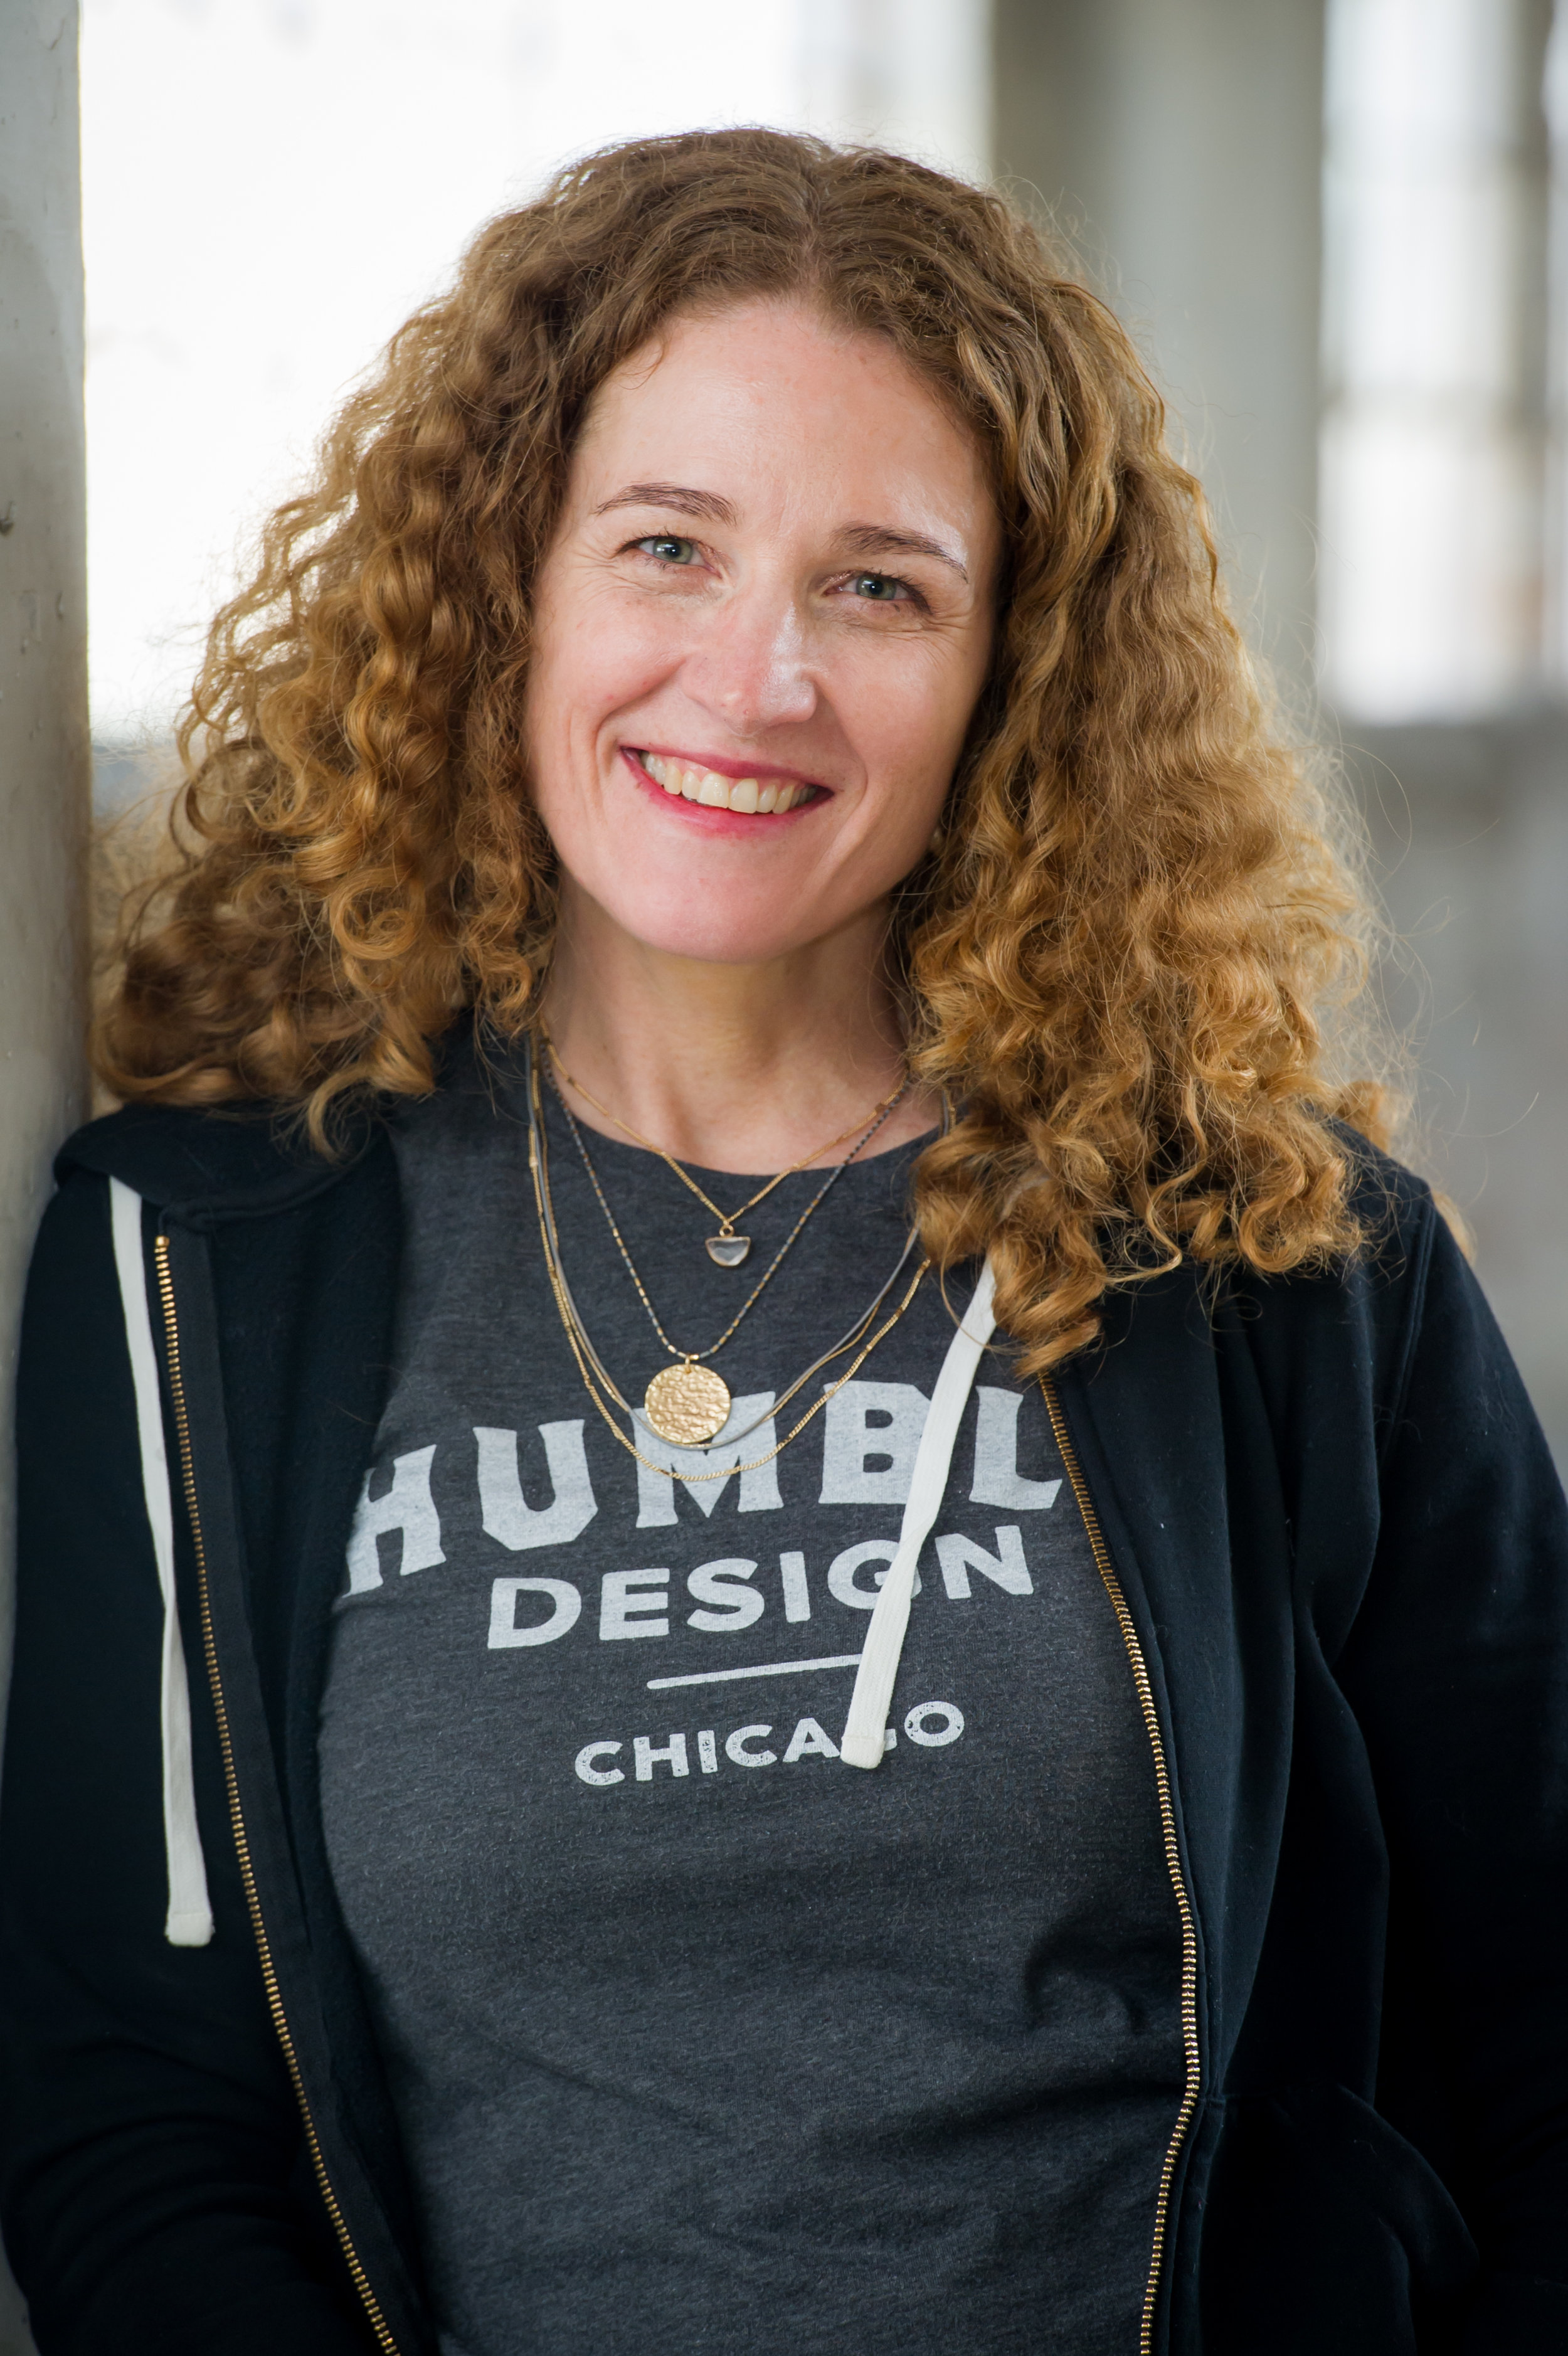 Julie Dickinson, Director